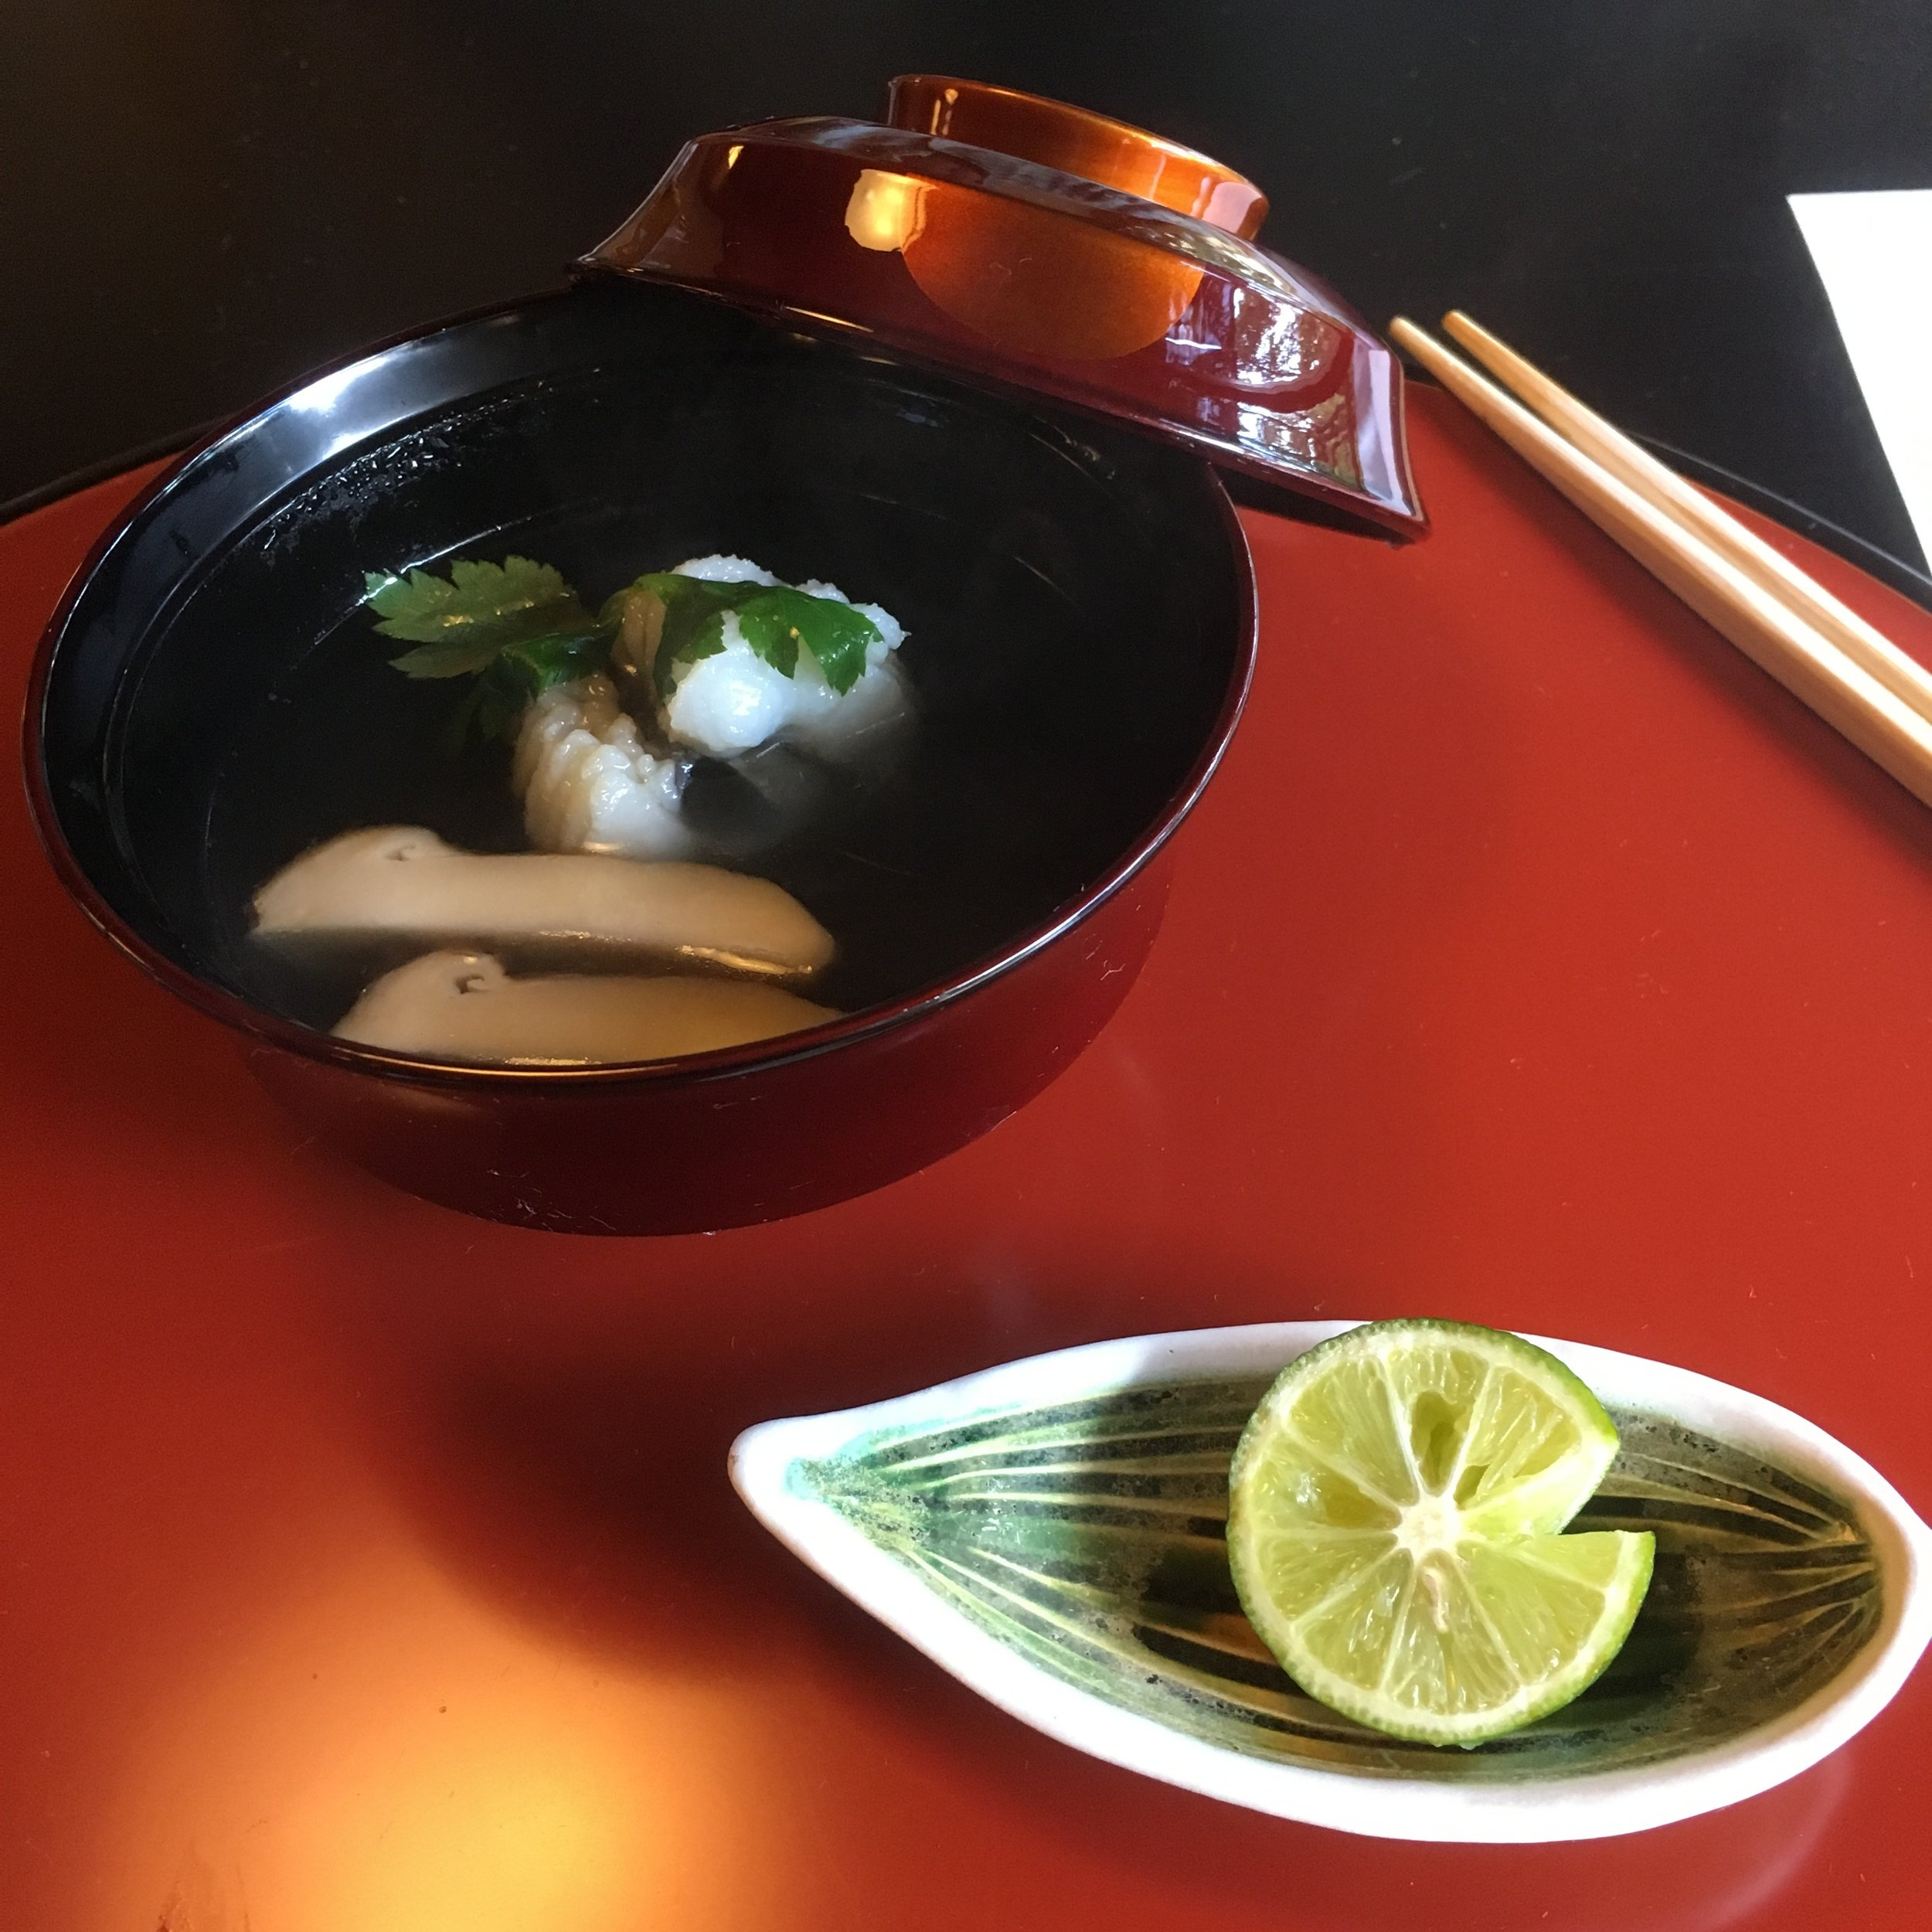 Pike conger and Matsutake mushroom